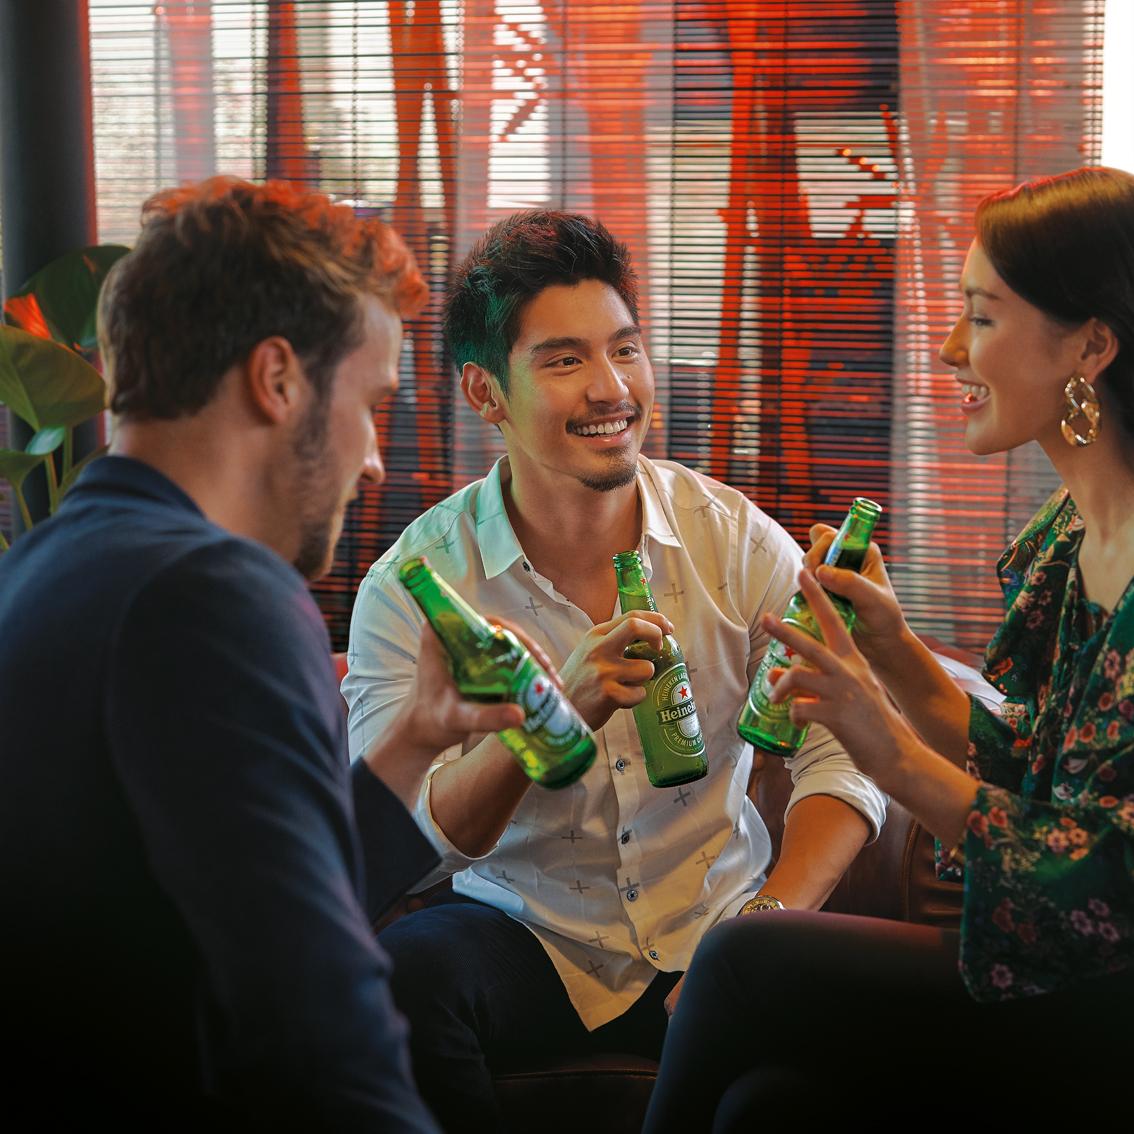 20180628-WTO Heineken 1318_HR.jpg